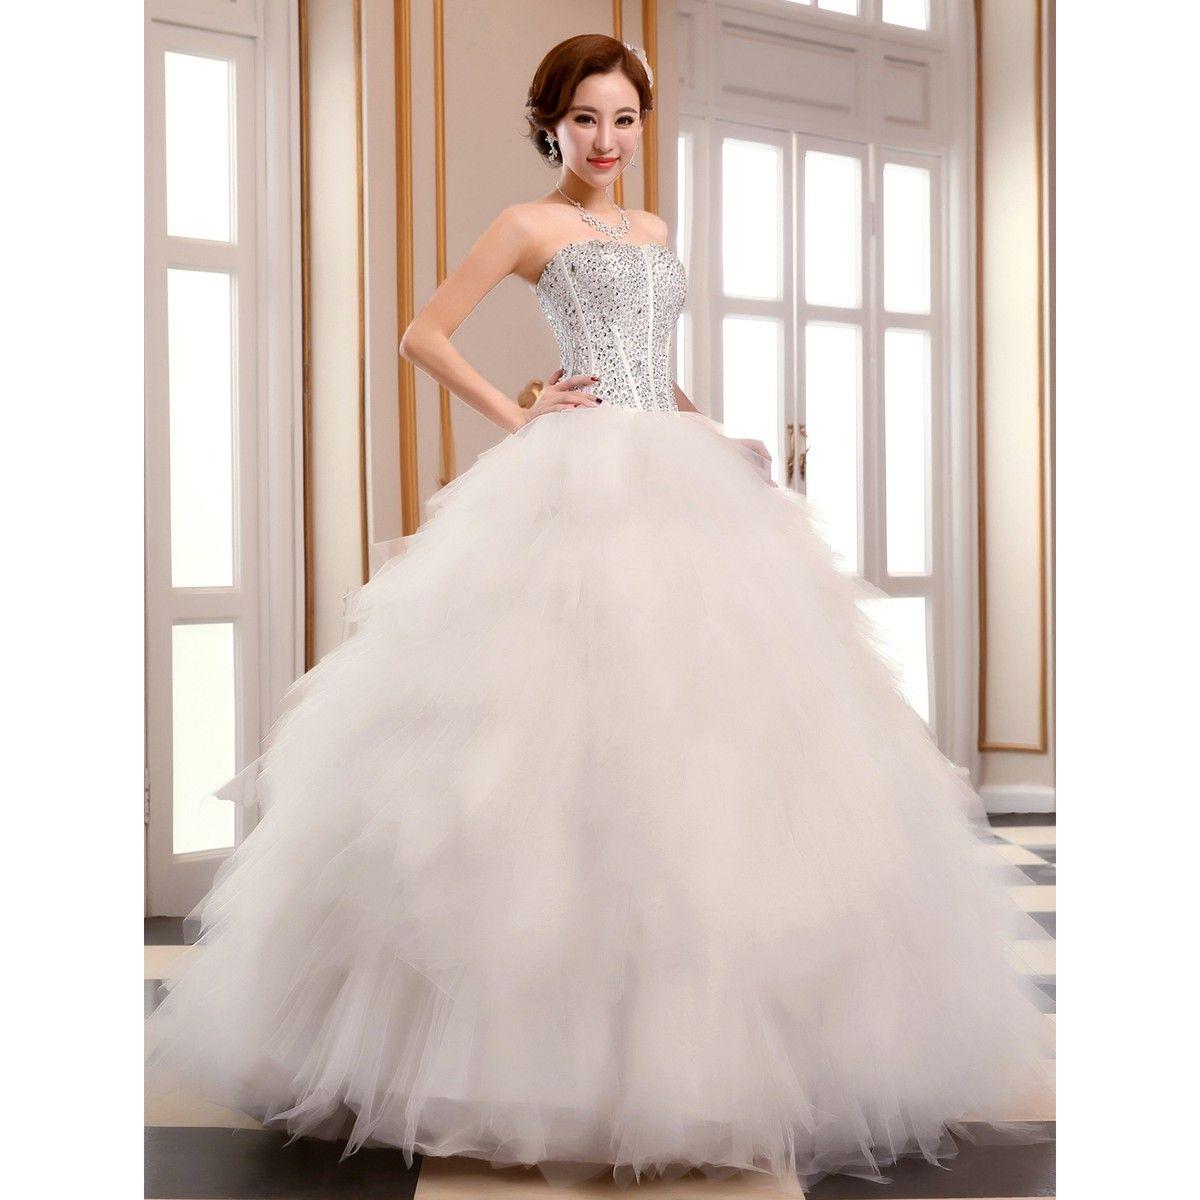 Ball Gown Strapless Floorlength Tulle Wedding Dress